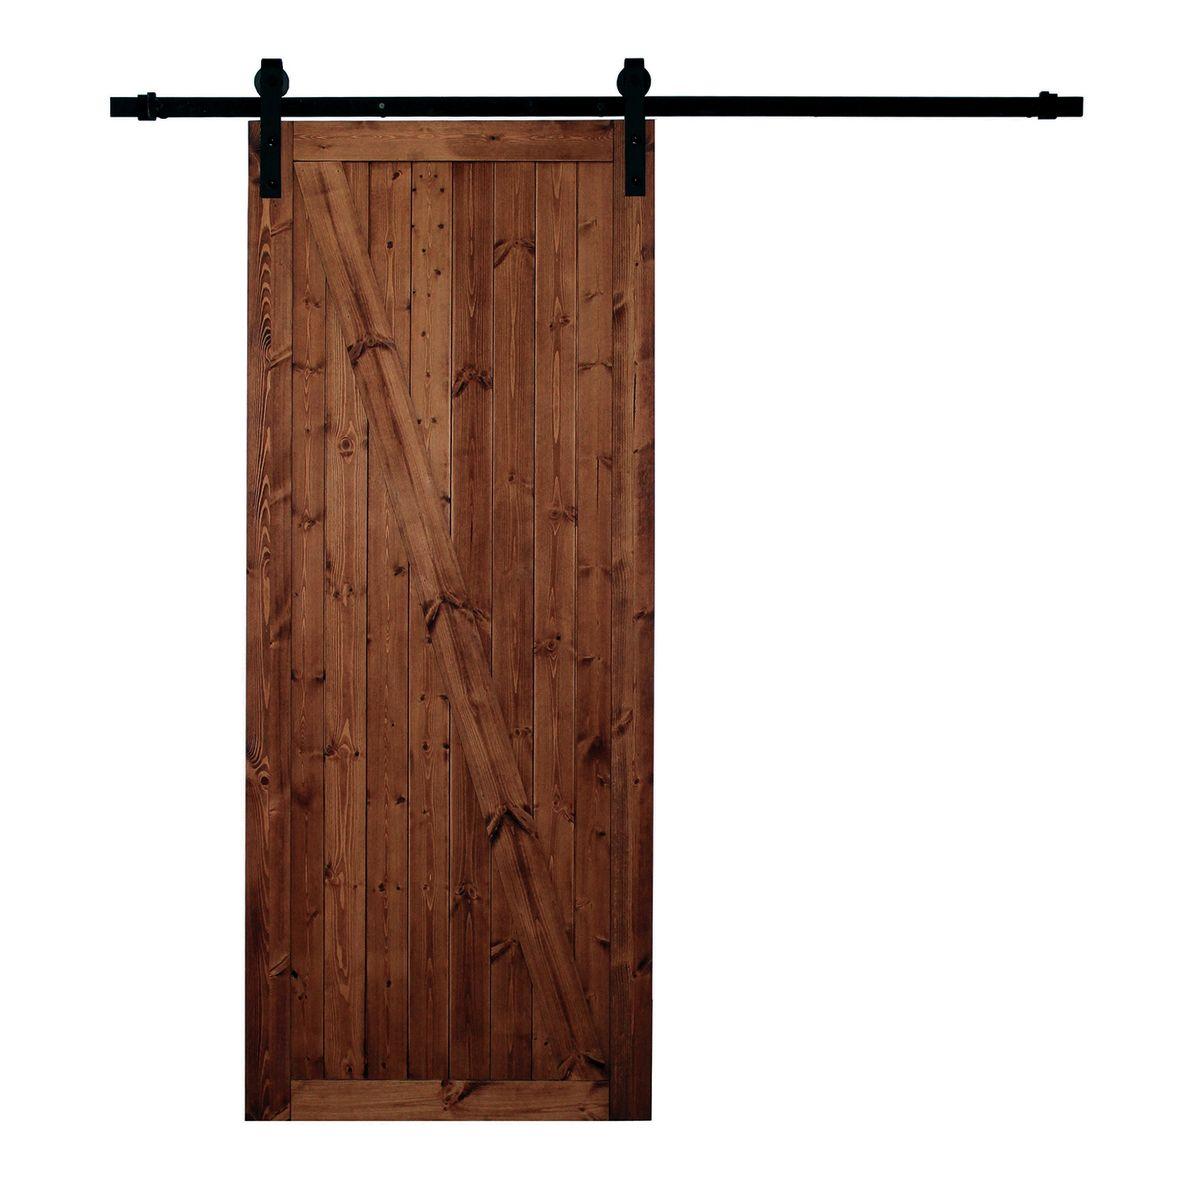 Porte scorrevoli in legno e vetro zp12 regardsdefemmes for Piani tavolo leroy merlin